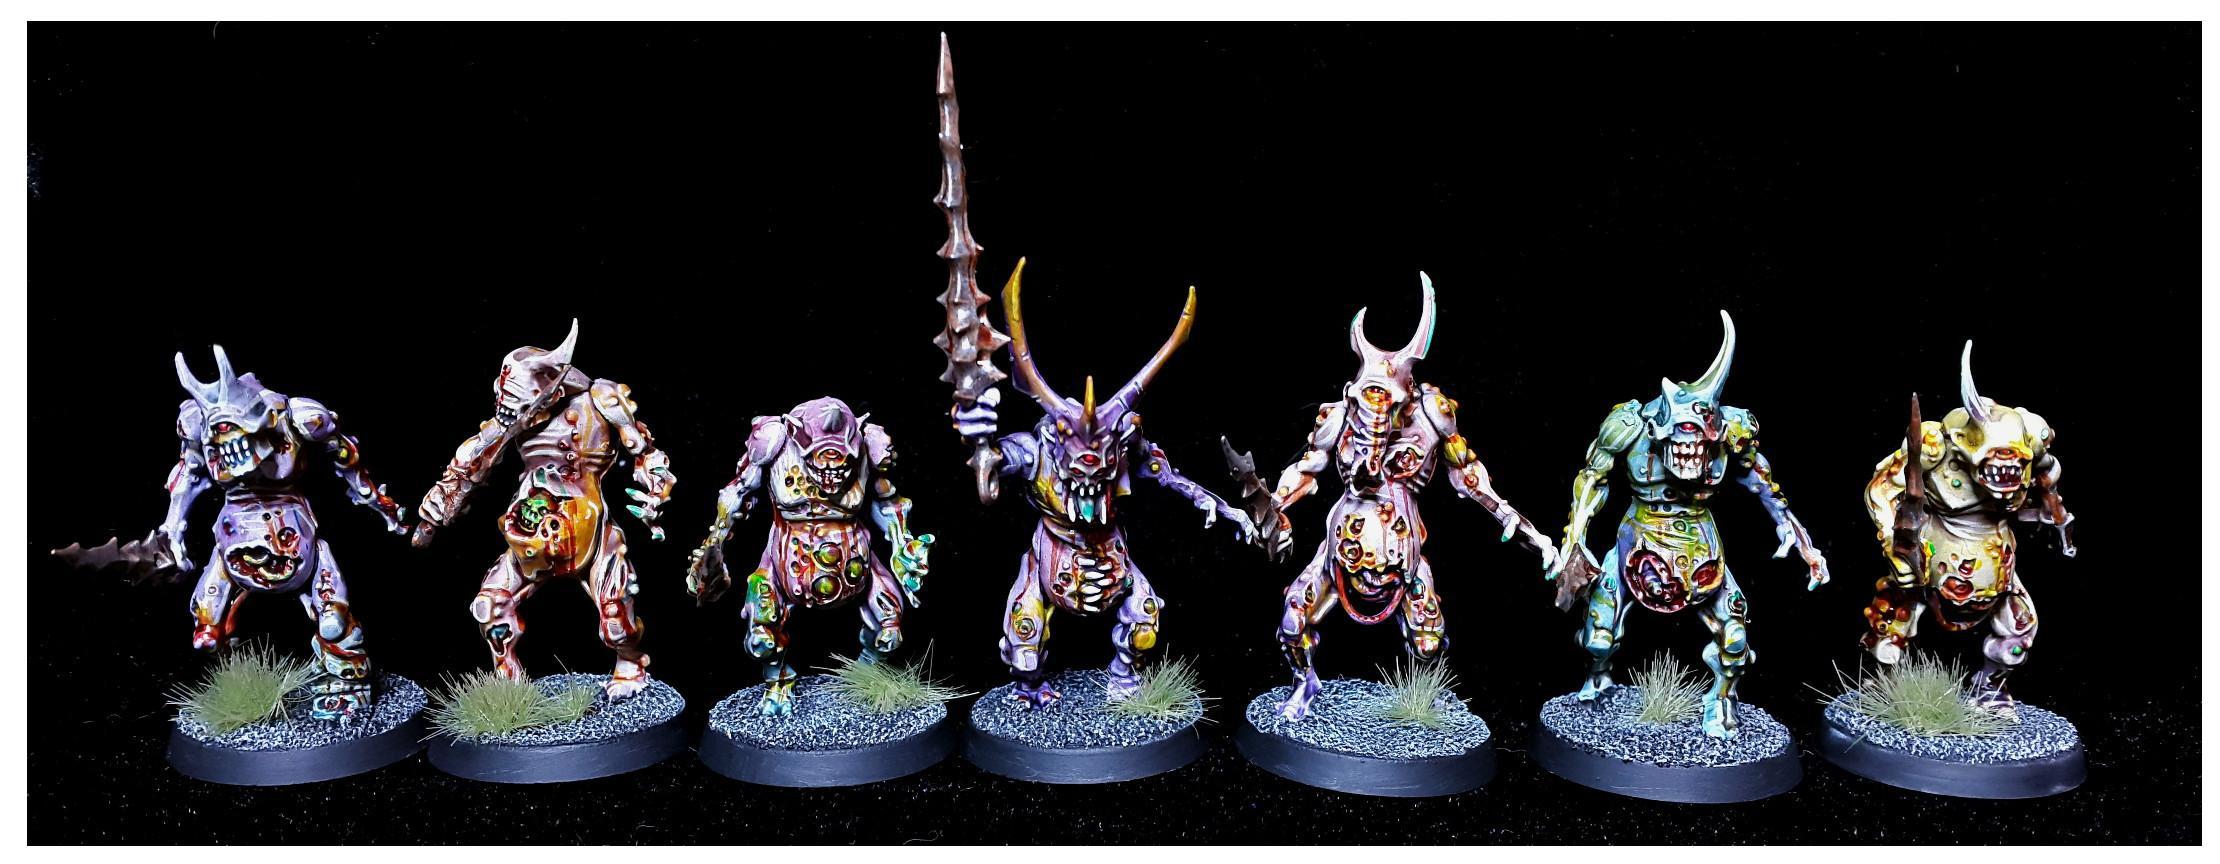 Bearer, Colour, Daemons, Nurgle, Plage, Plaguebearers, Rot, Sigmar, Warhammer 40,000, Warhammer Fantasy, Zombie